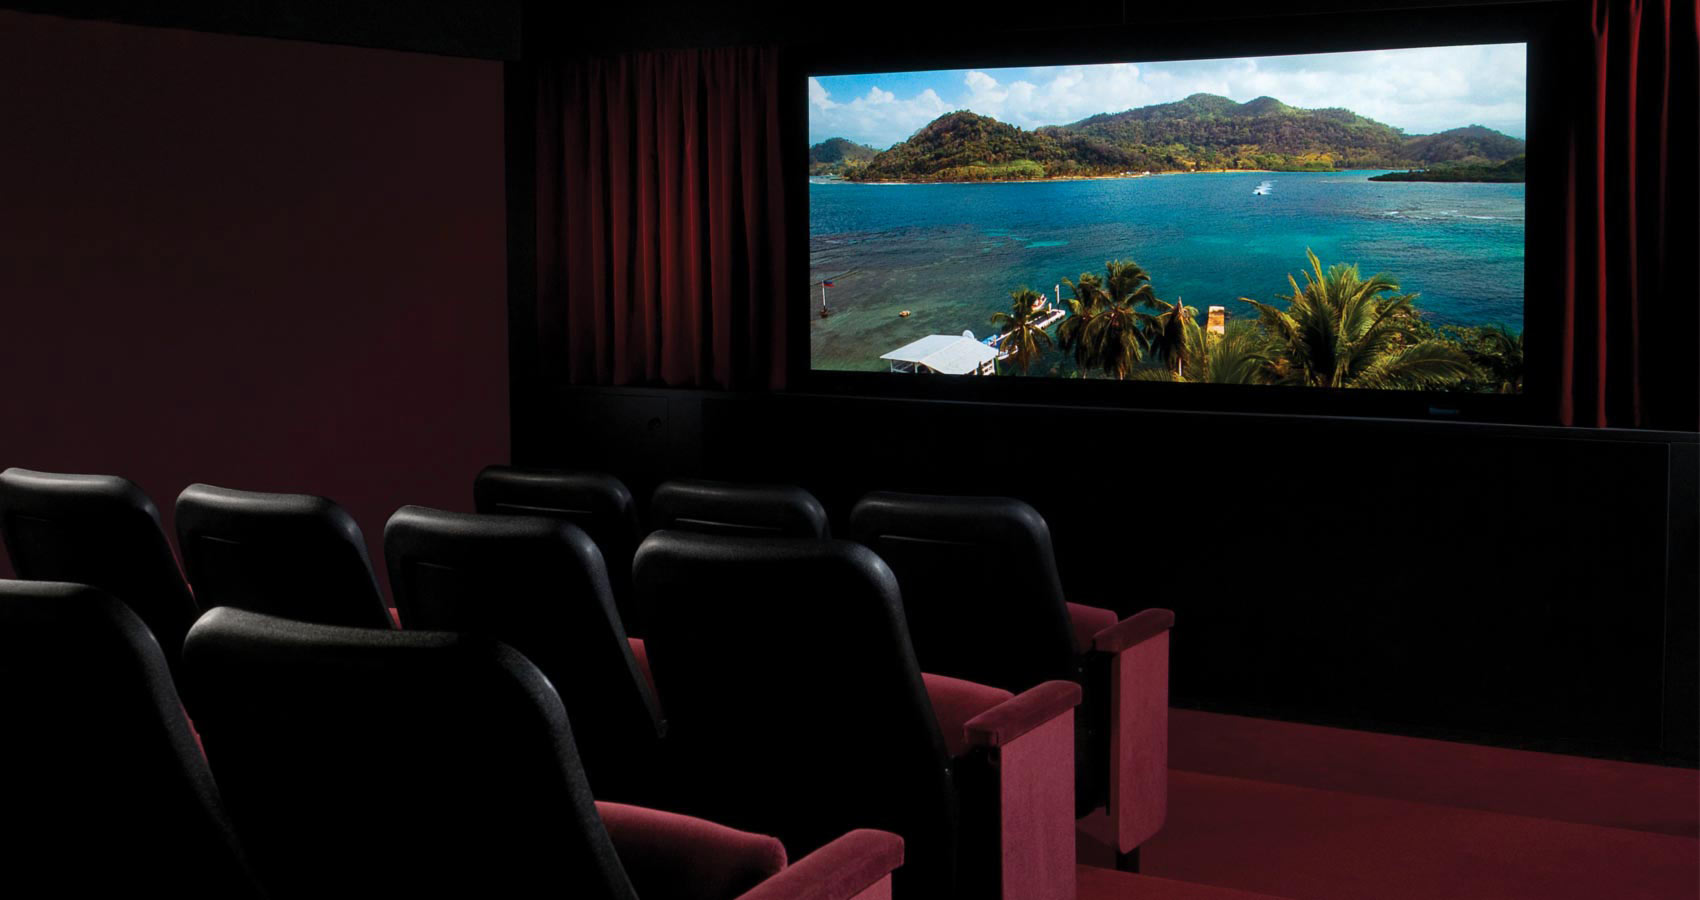 47 movie theatre wallpaper on wallpapersafari - Home theater wallpaper ...